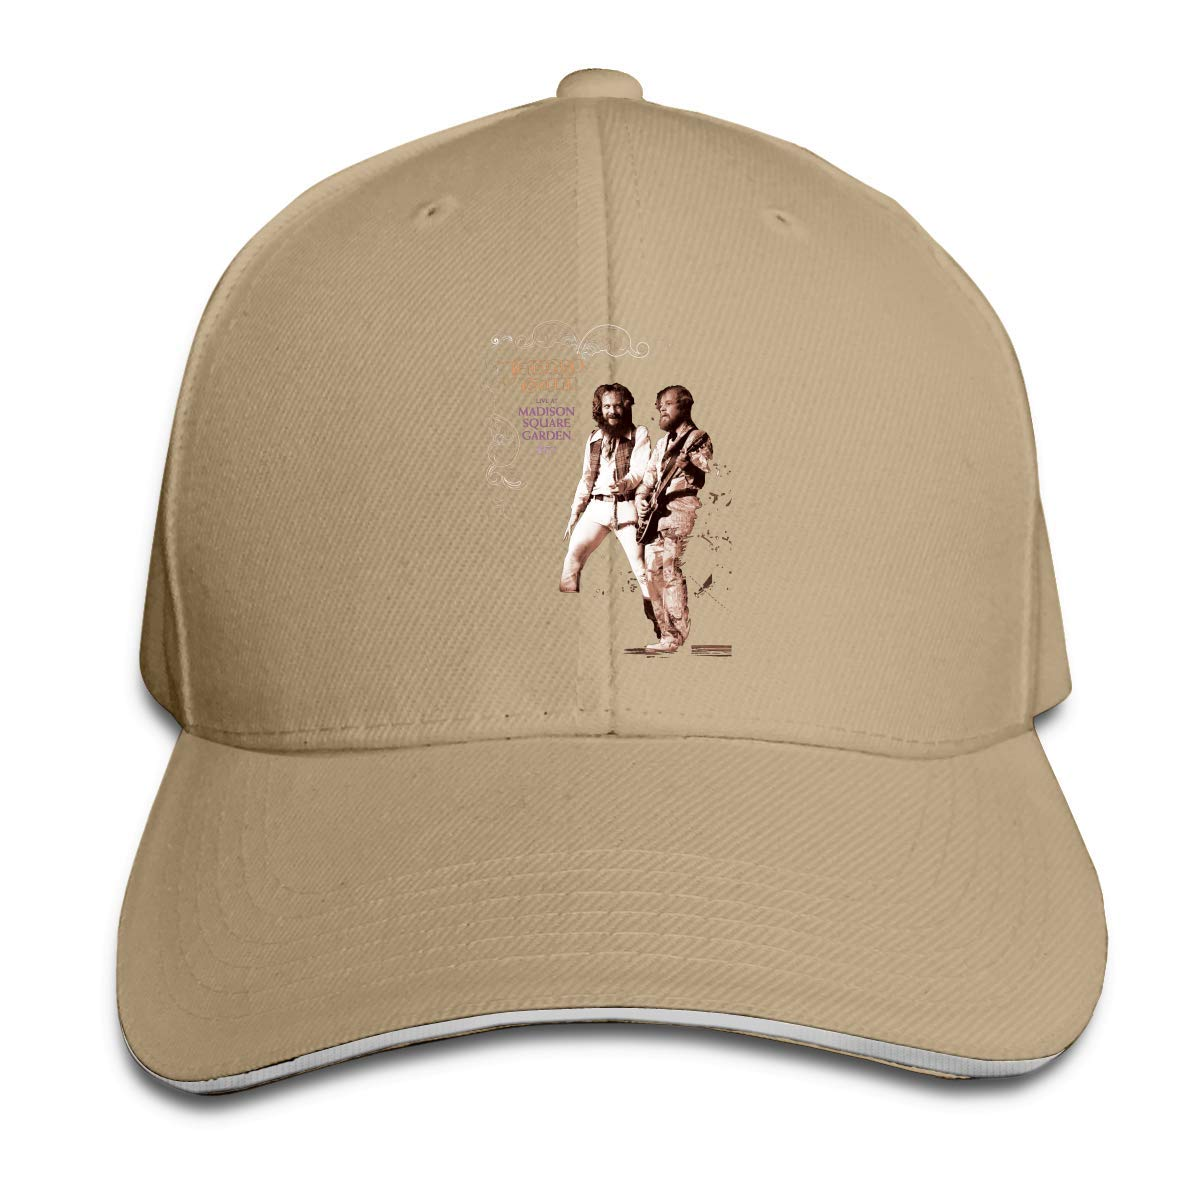 CustomART Jethro Tull Women/&Men Sandwich Hat Sports Outdoors